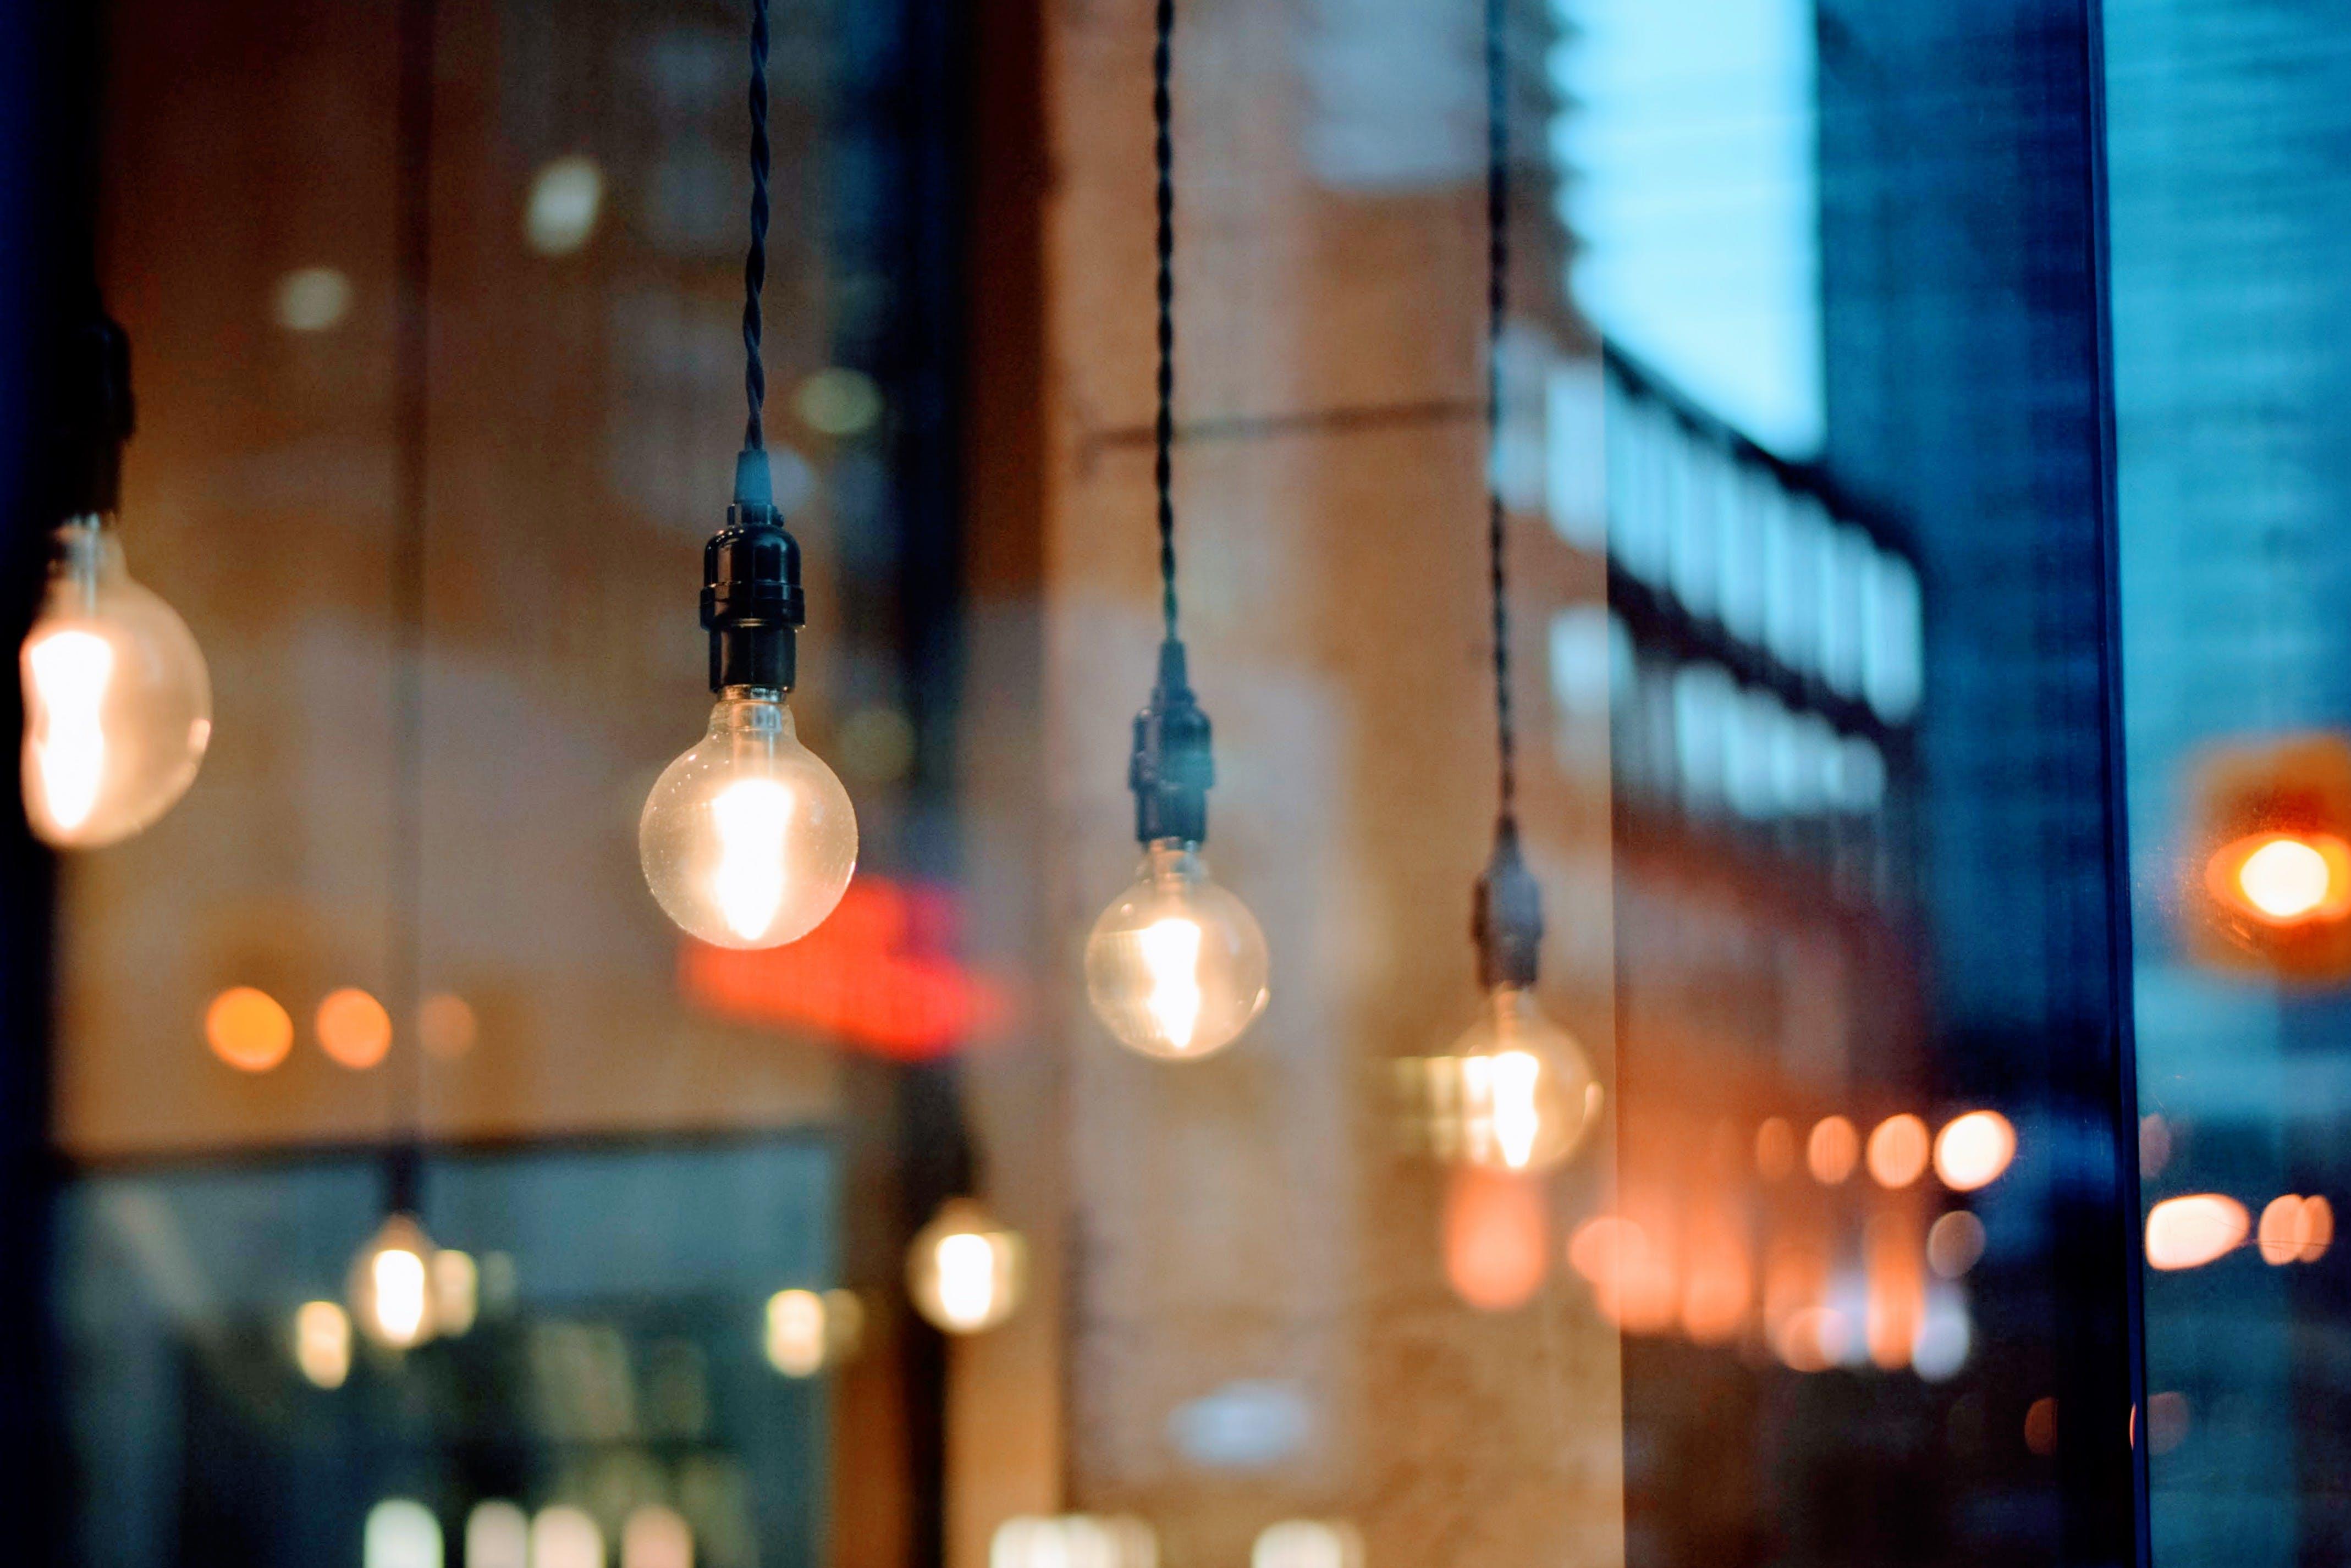 Selective Focus Photography of Light Bulbs